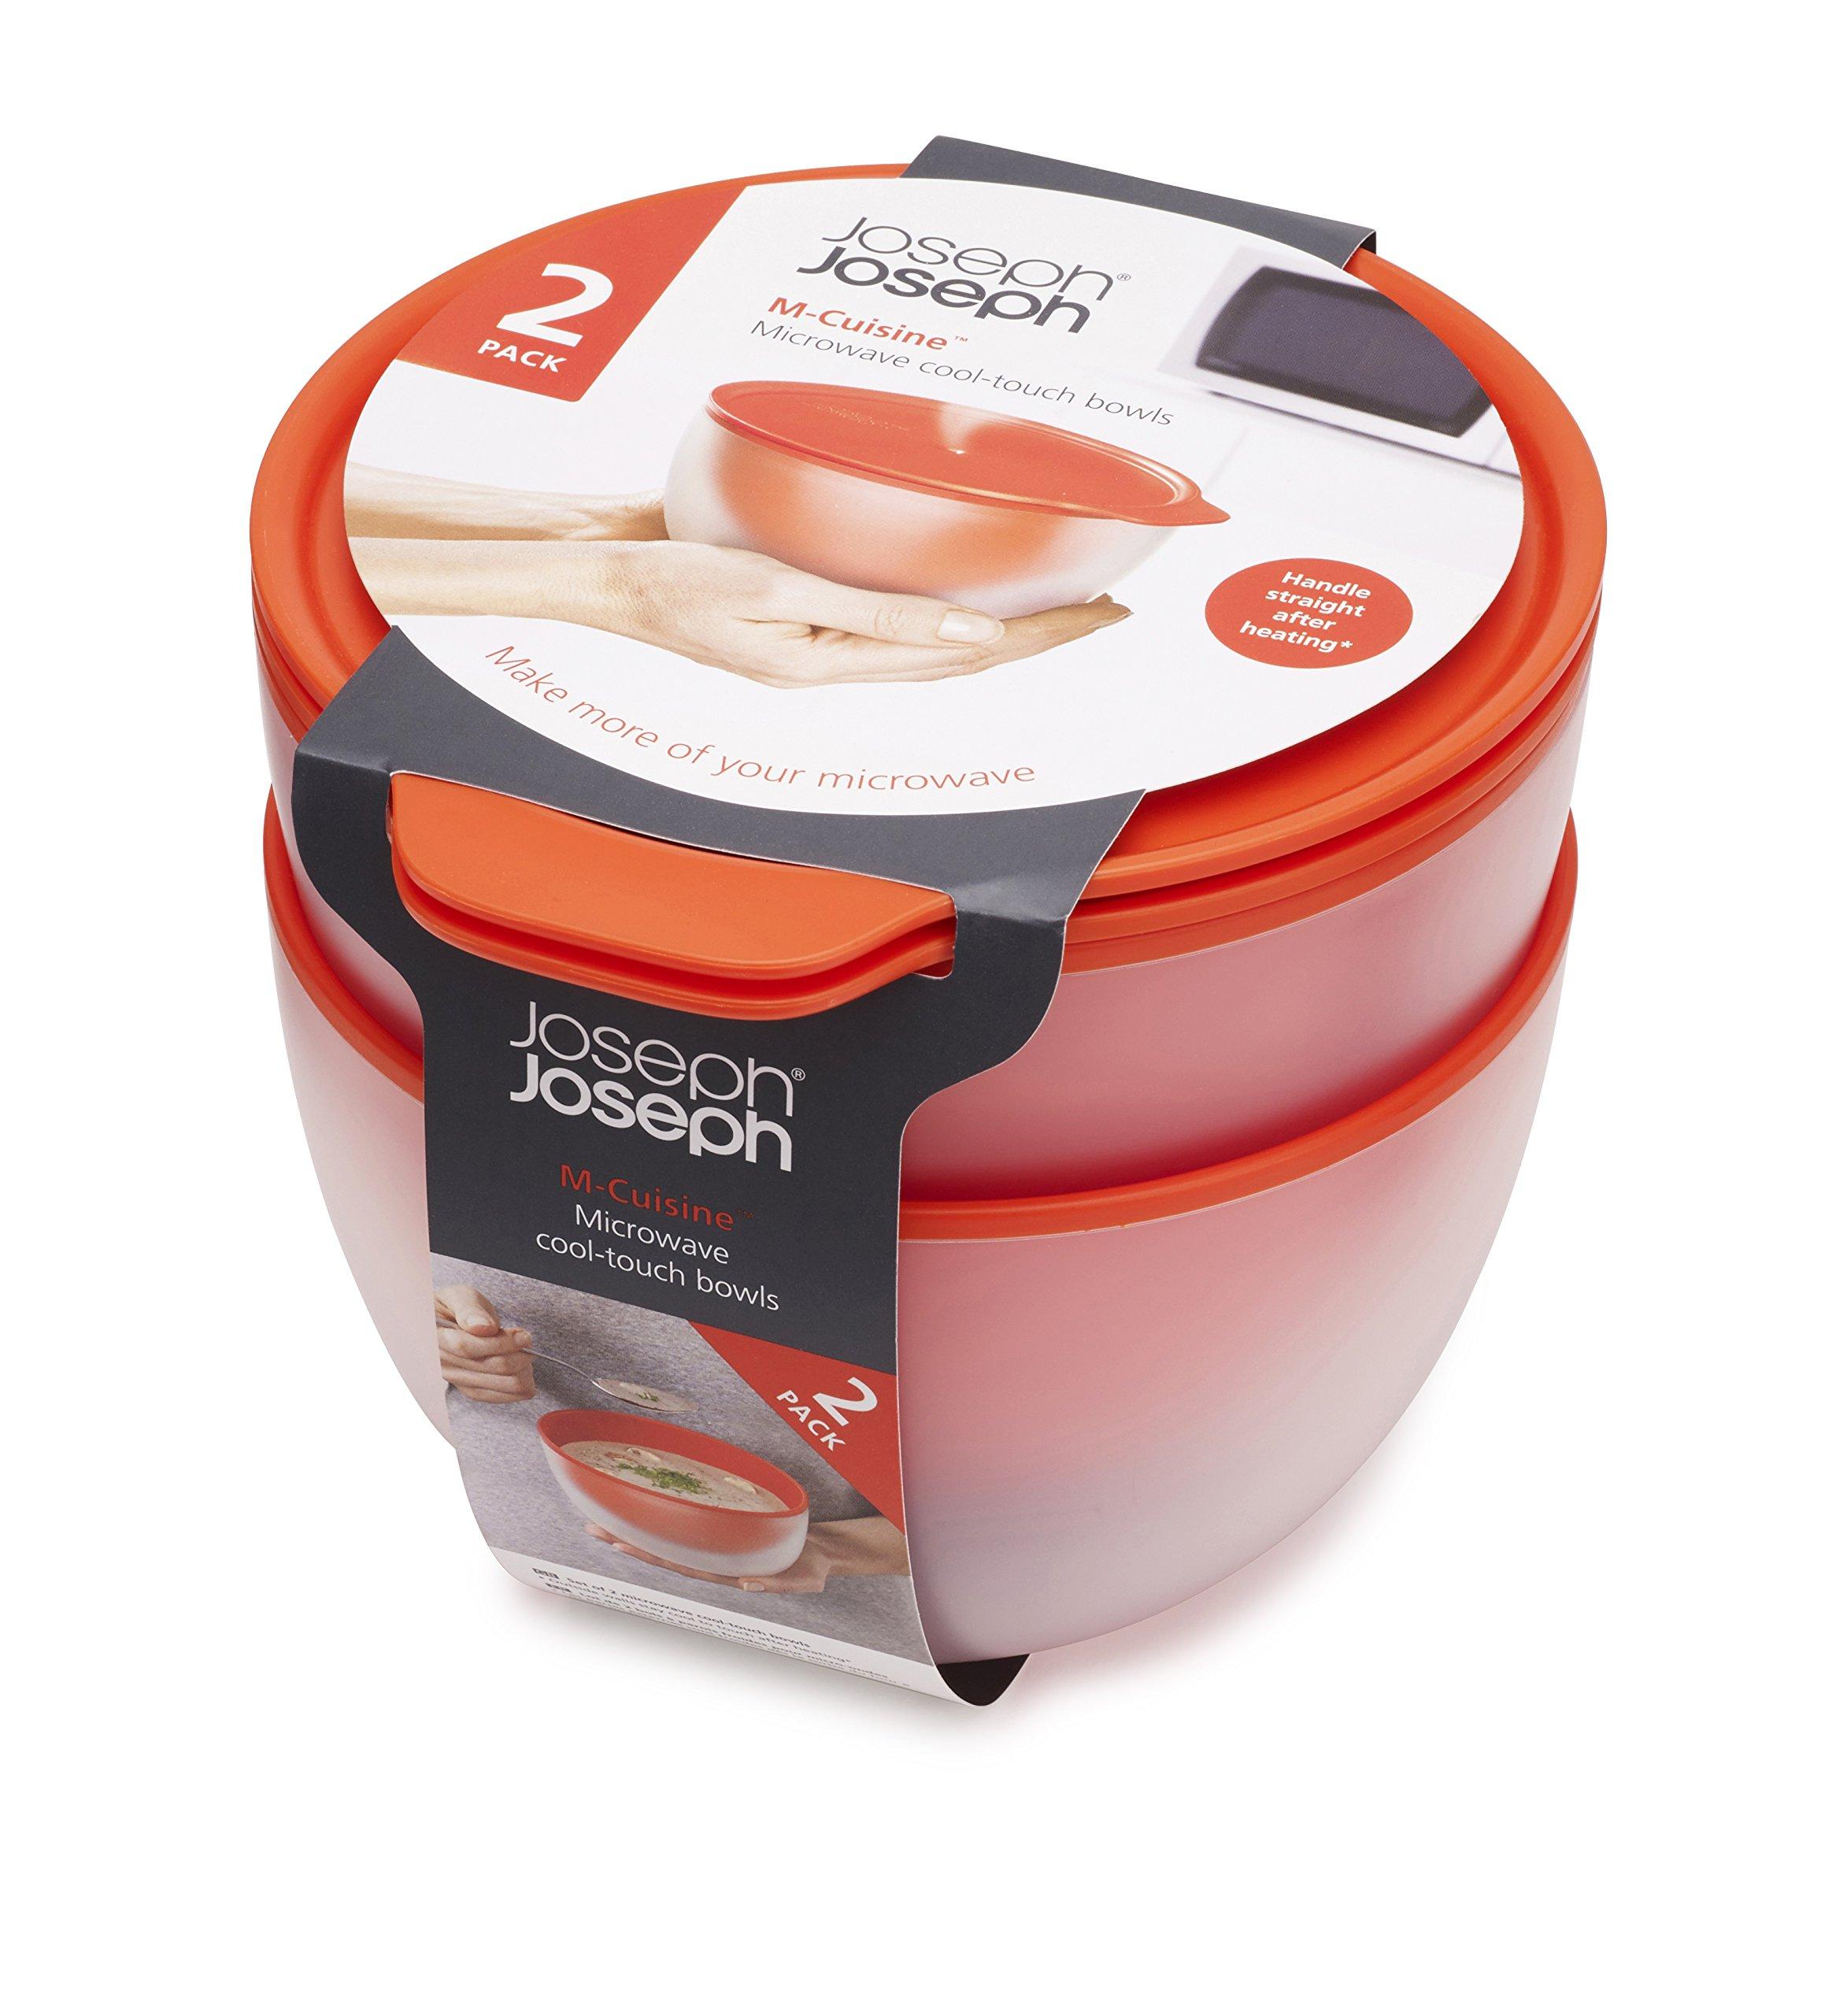 Joseph Joseph 45005 M-Cuisine Cool Touch Microwave Bowl Set of 2, Orange